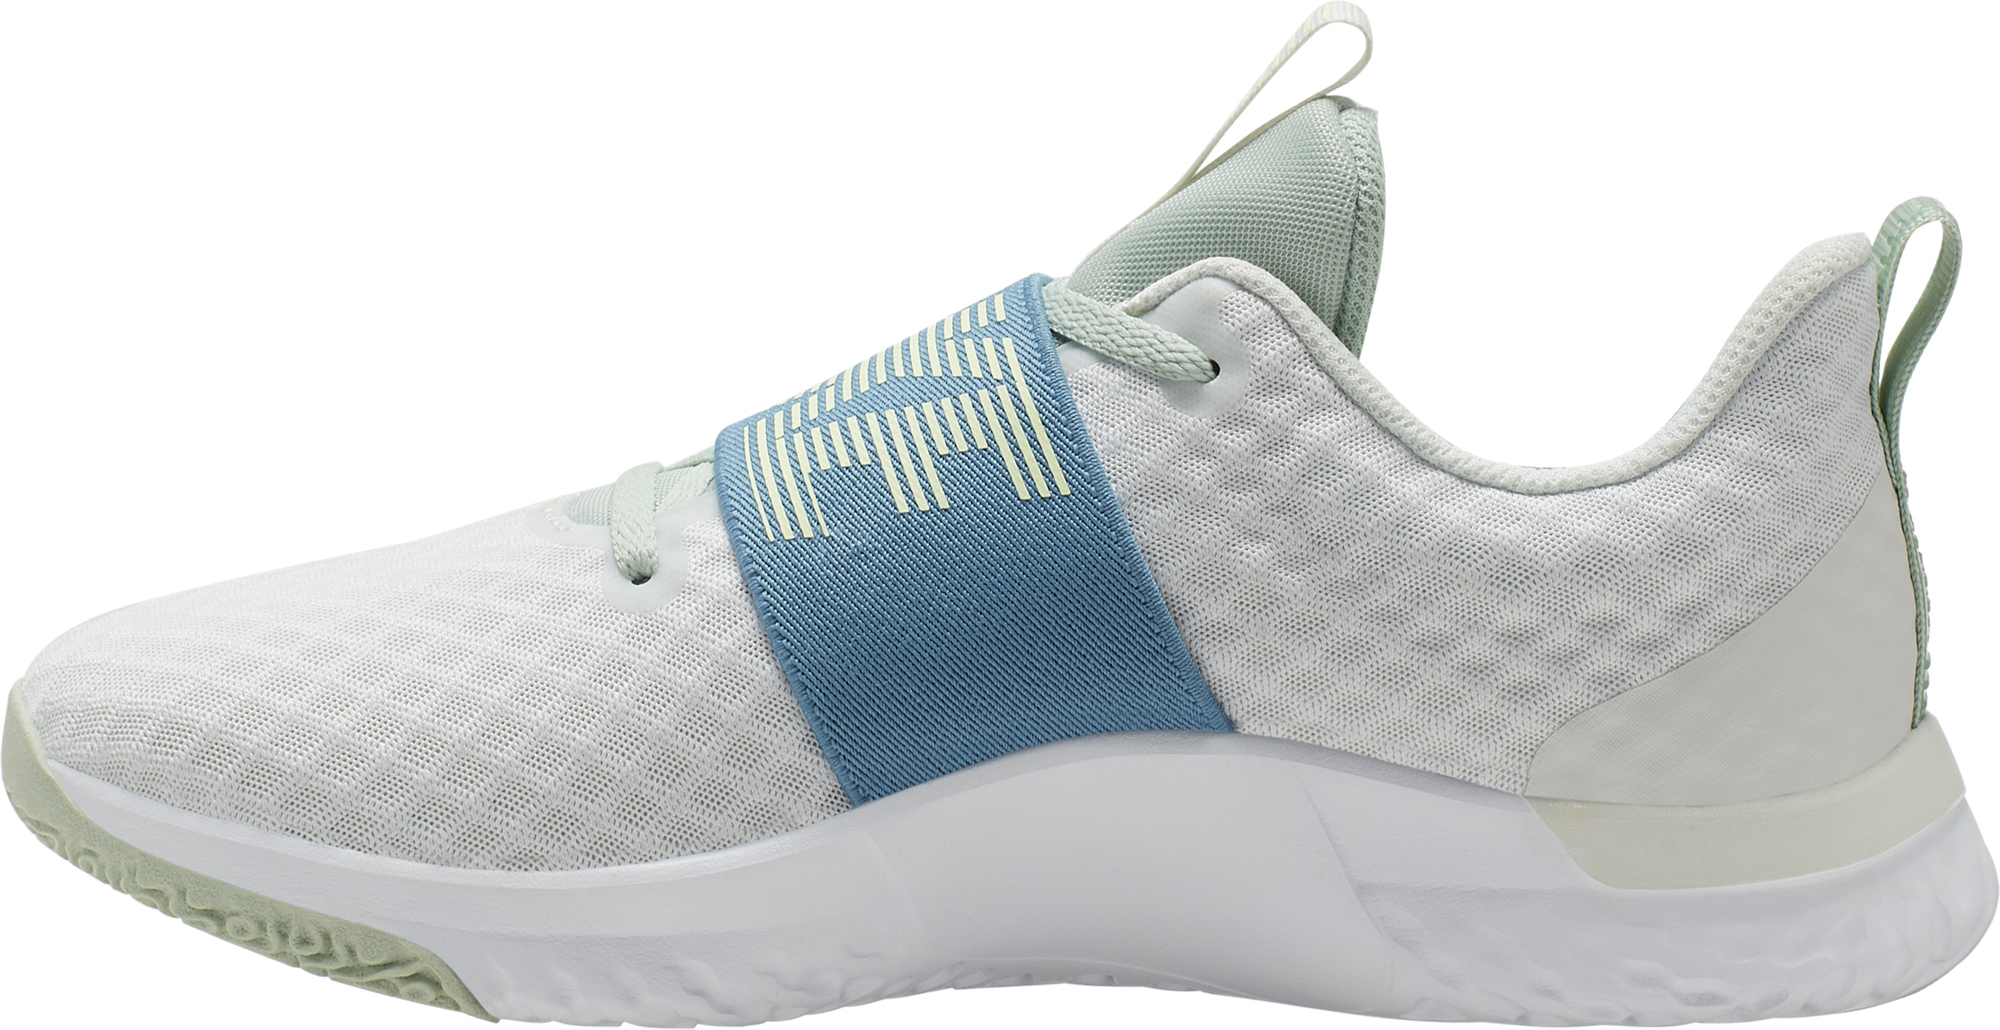 Nike Кроссовки женские Nike Renew In-Season Tr 9, размер 40 кроссовки женские saucony cohesion 10 цвет черный бирюзовый s15333 18 размер 9 40